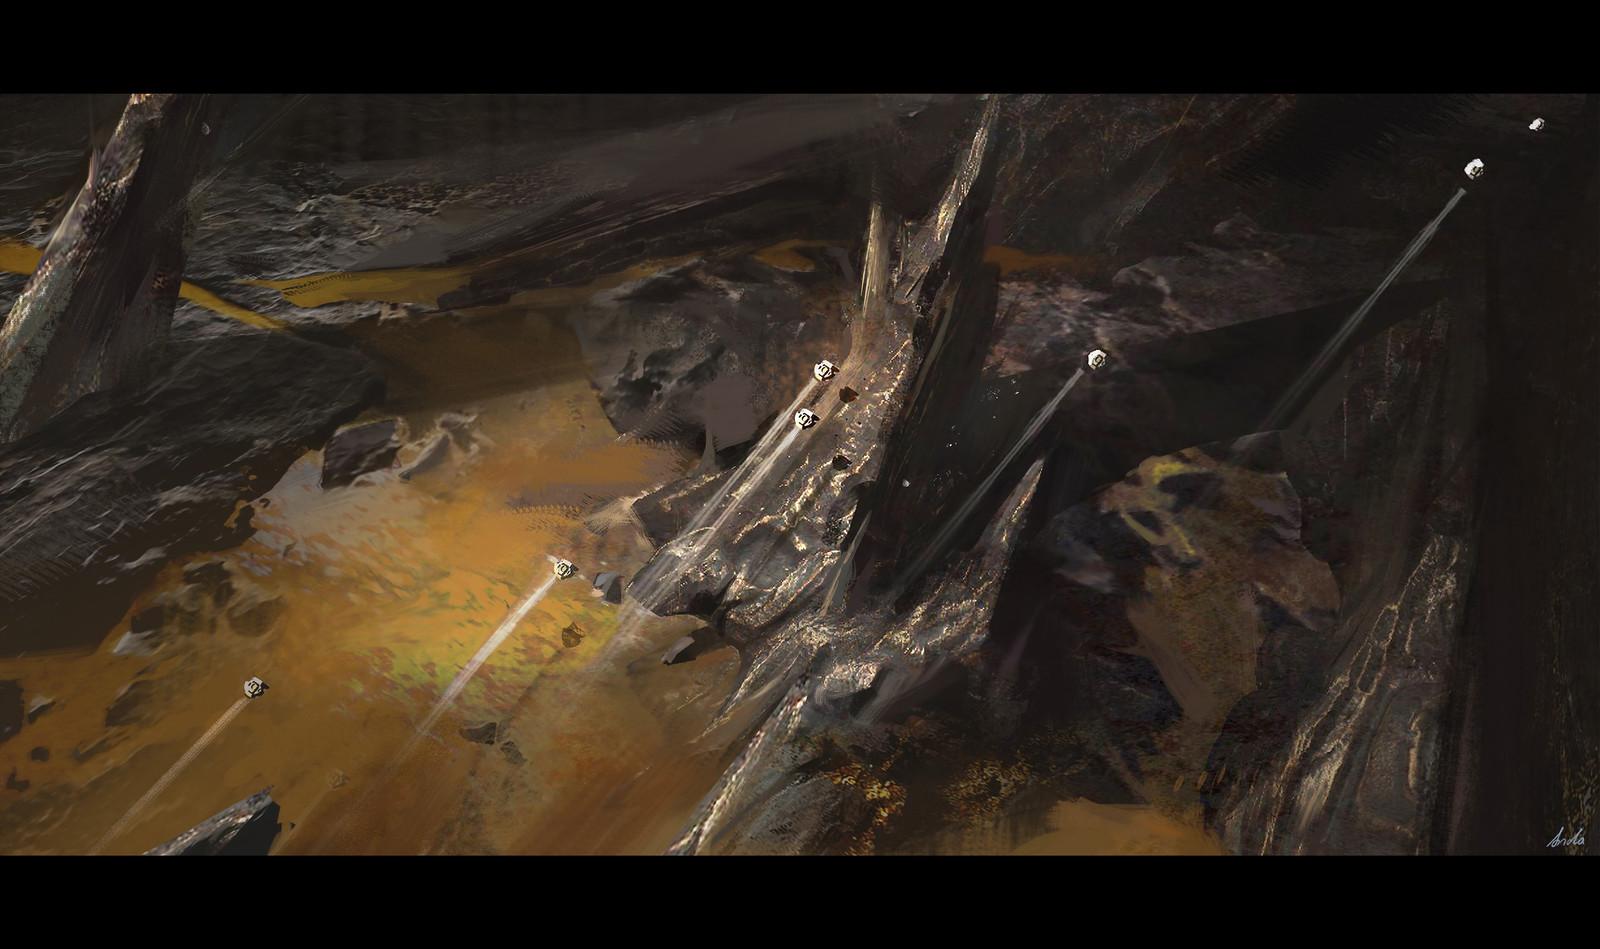 Cetus Fall: Ferric Rock & Krill Energy